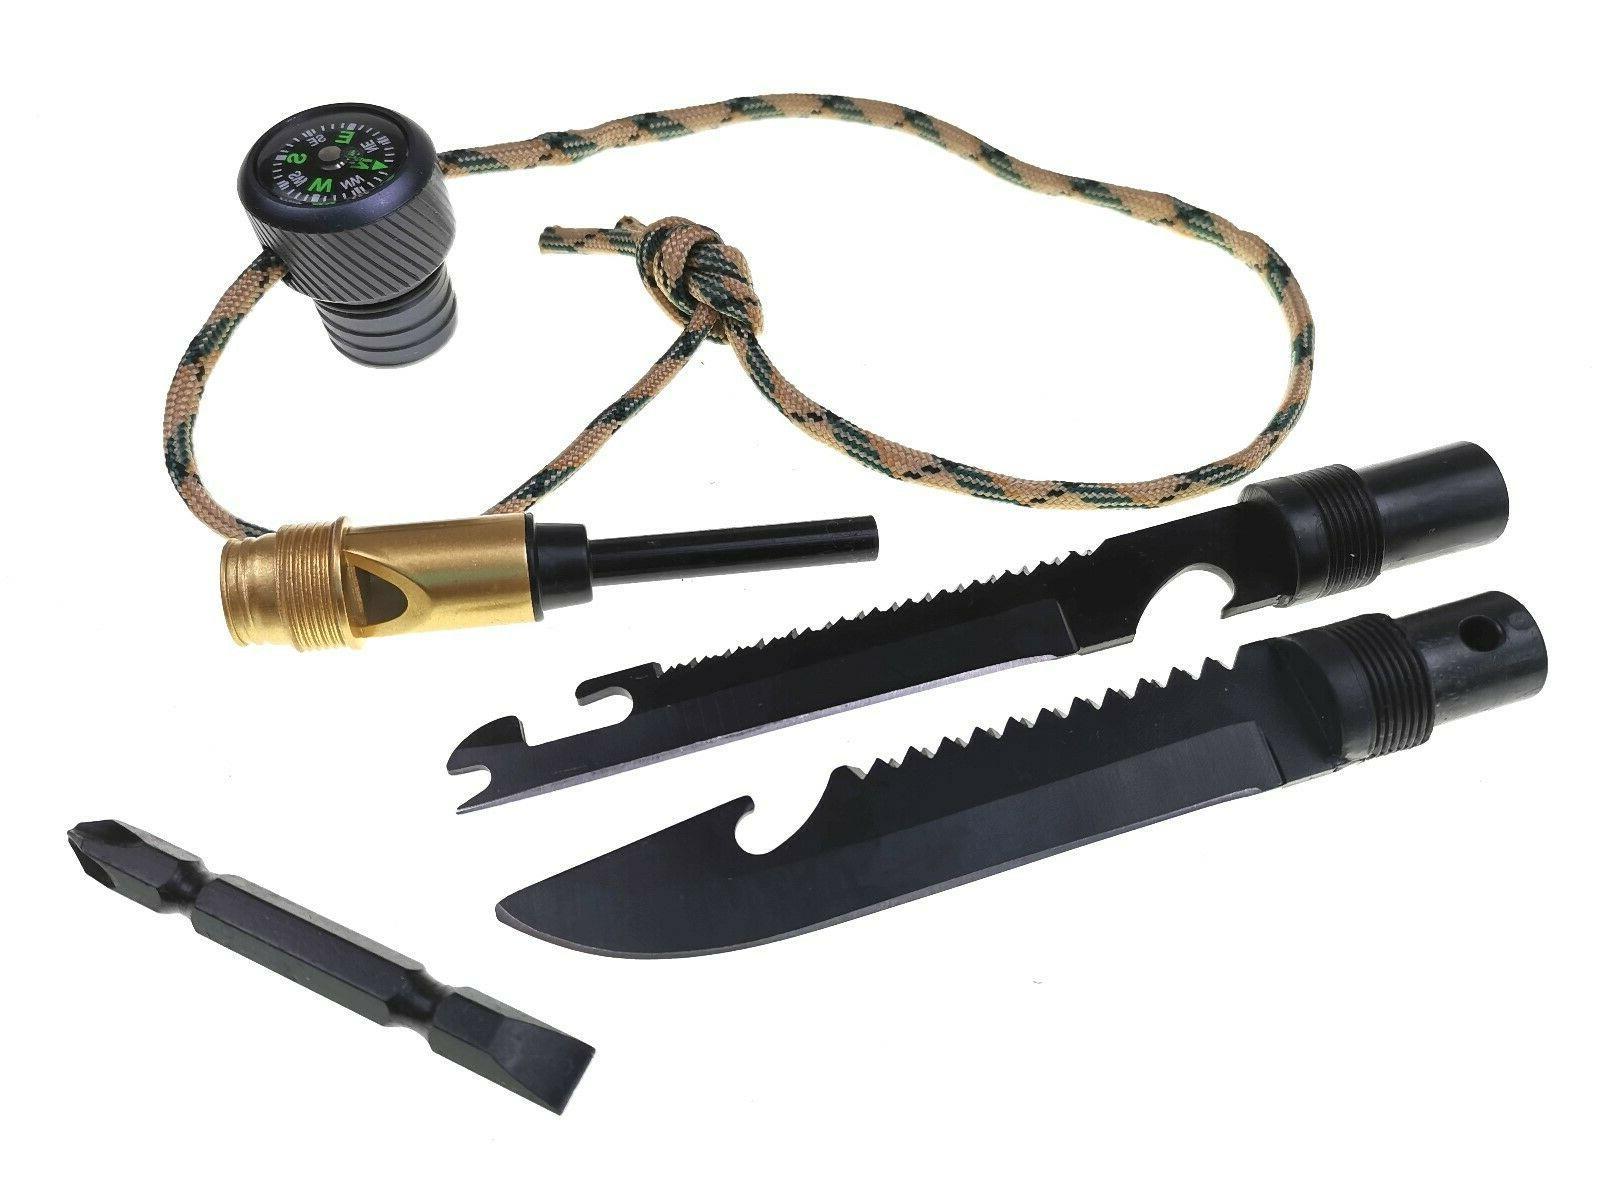 Multi-Function Walking Trekking Pole Defense Stick Screwdriver